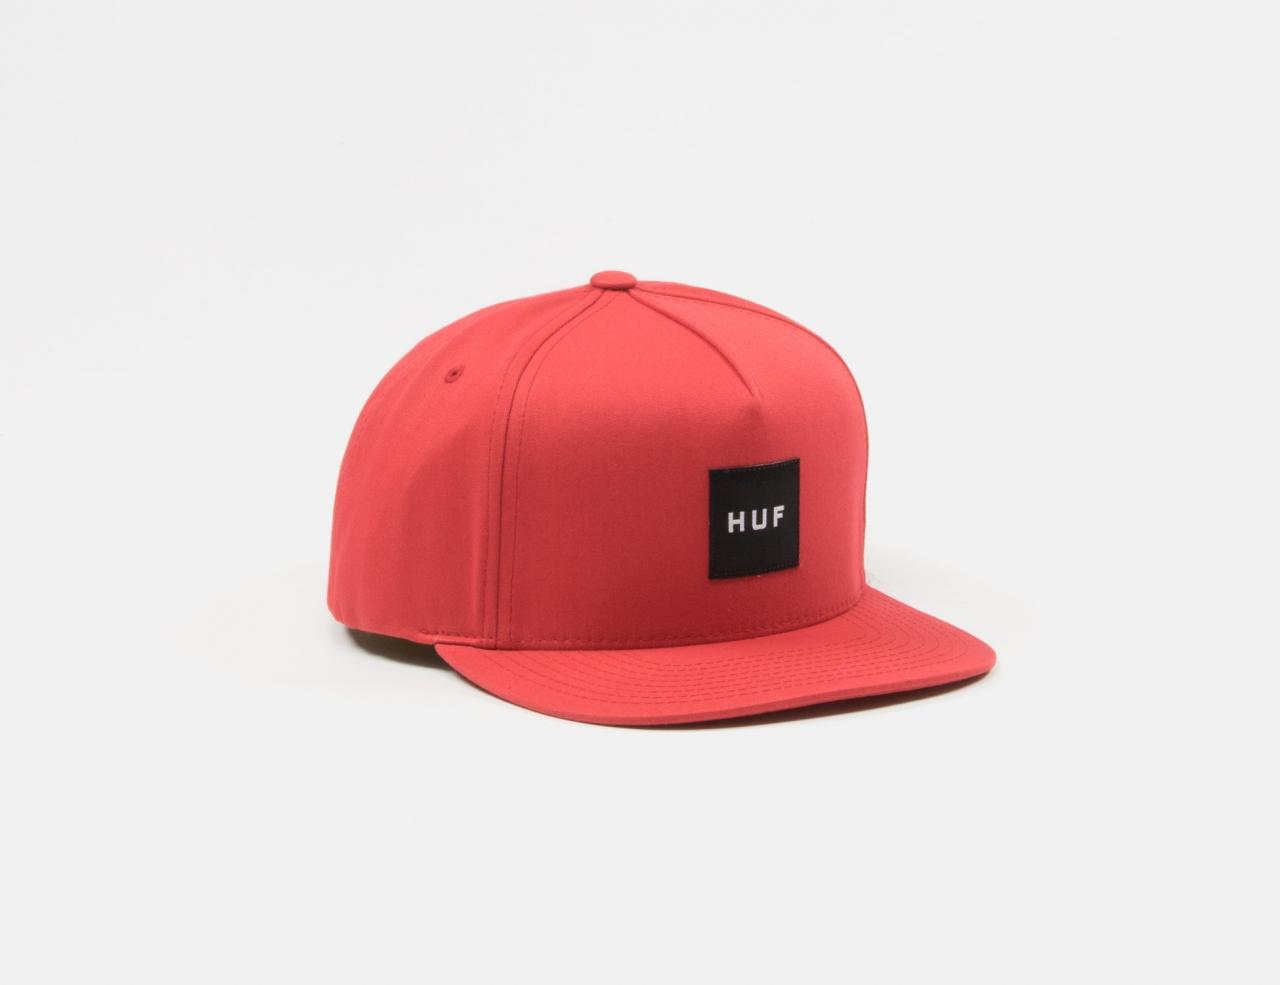 HUF Essentials Box Snapback Cap - Rio Red